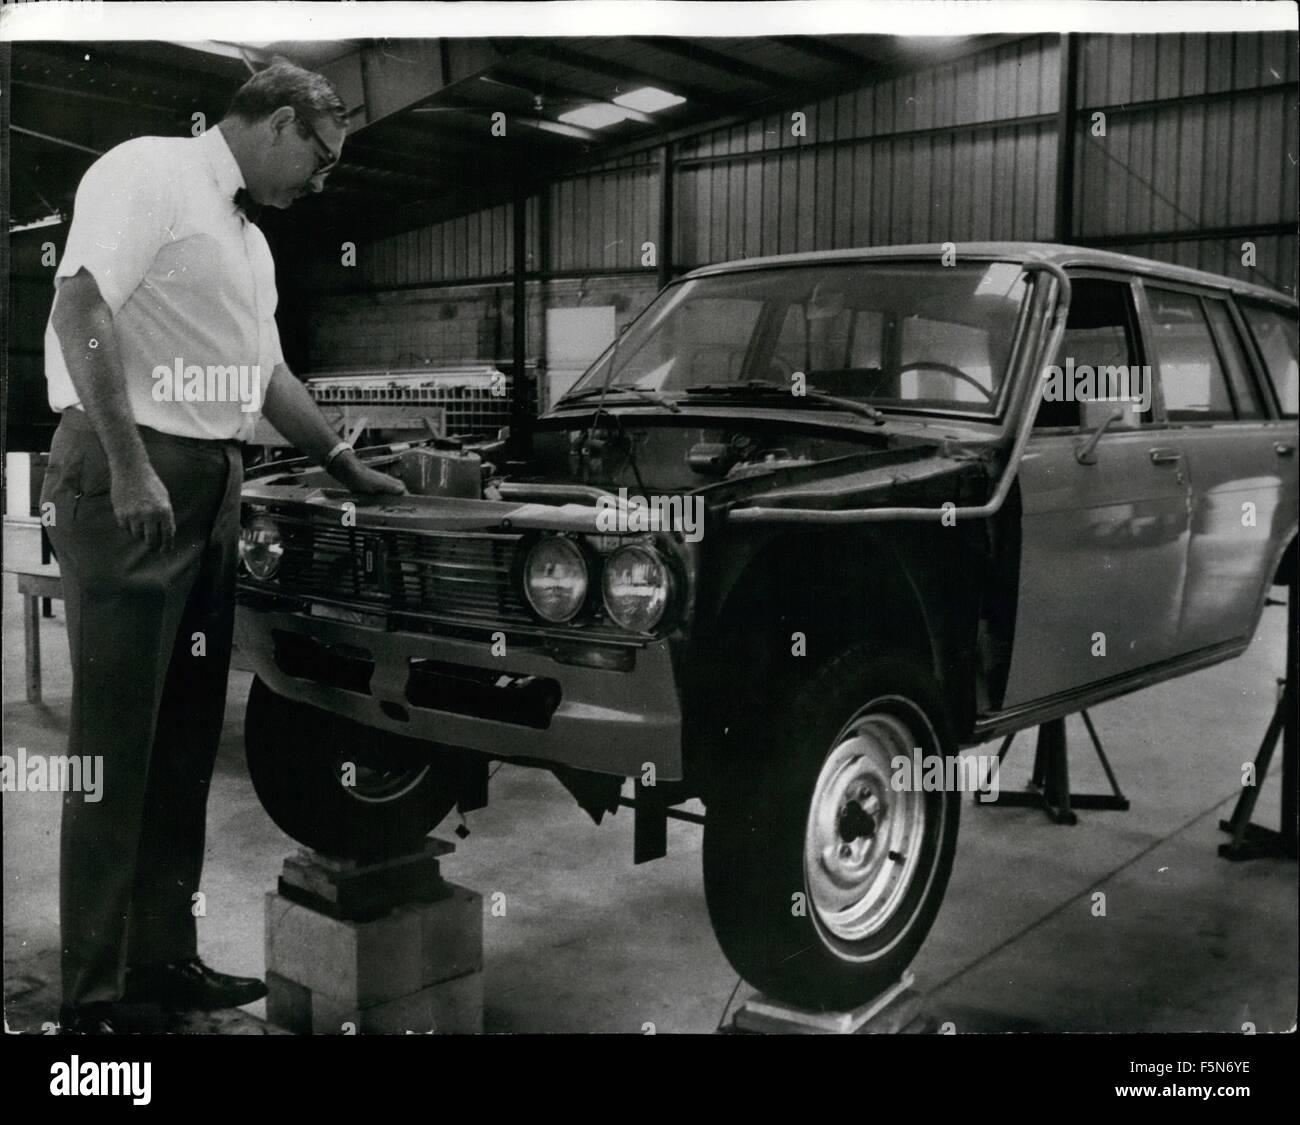 1972 - U.S. Inventor Develops Revolutionary Non-Pollution Engine ...